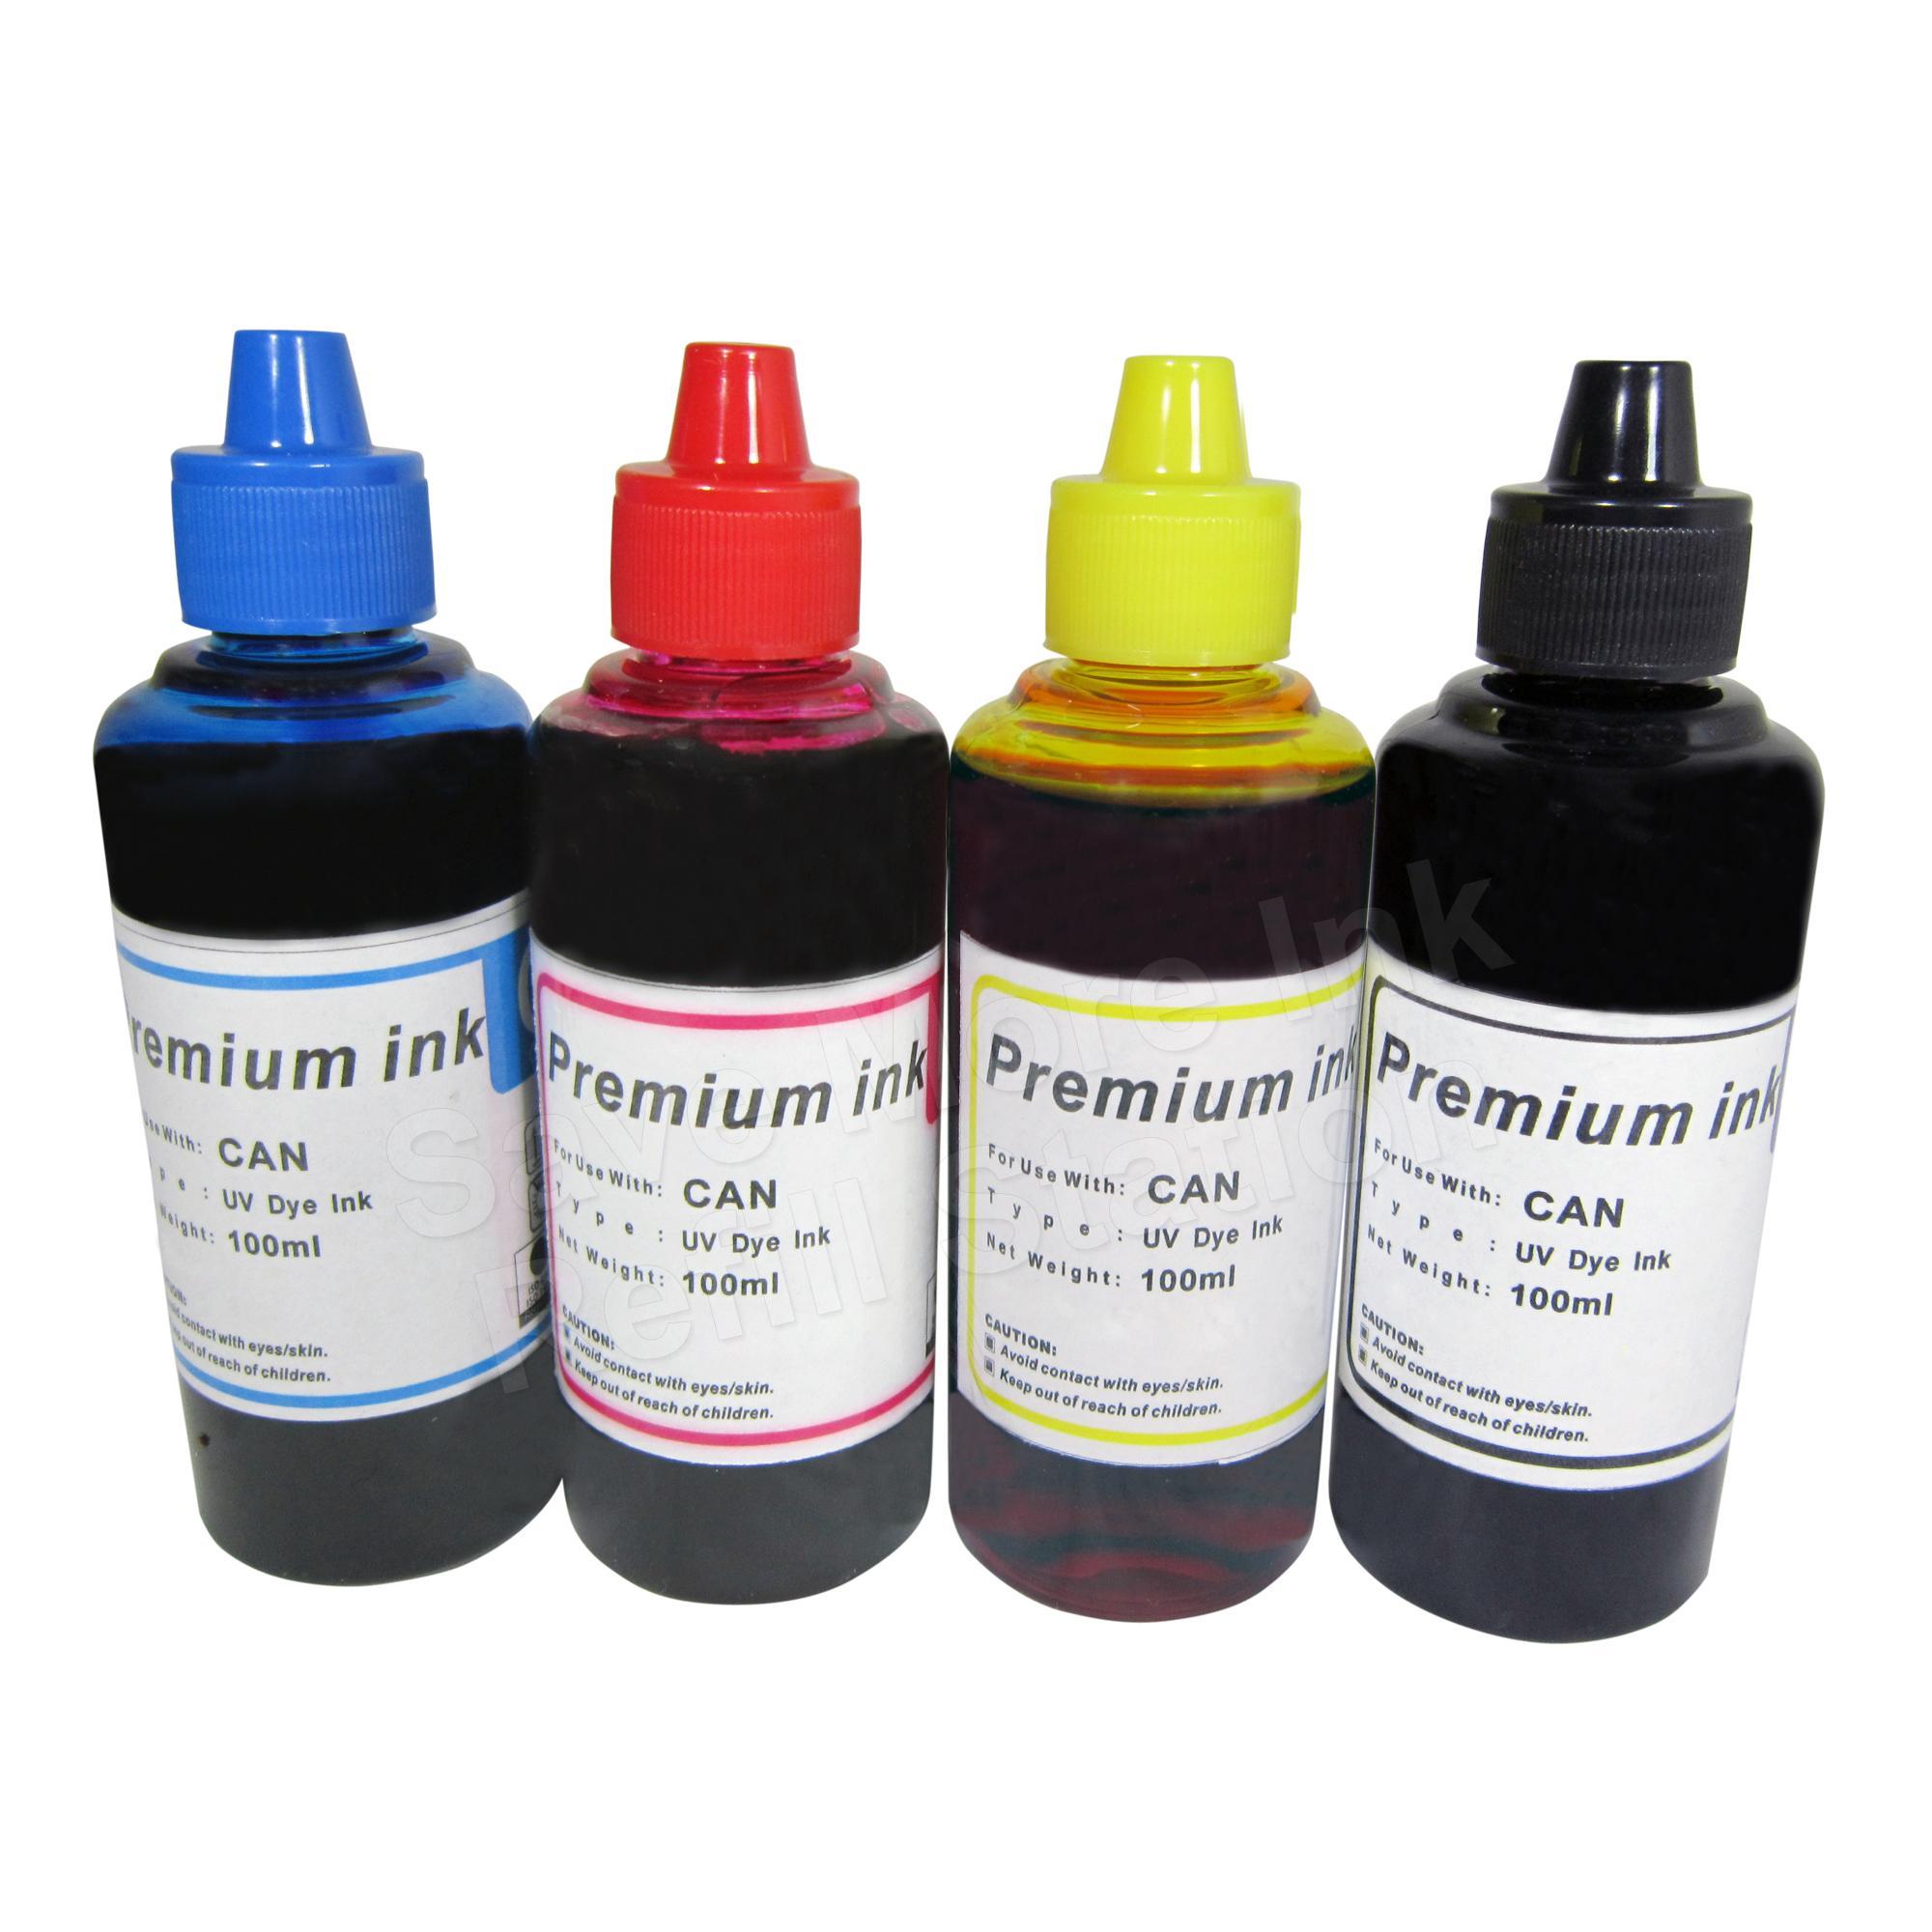 Premium Dye Inks 100ml for Canon/HP Inkjet Printers, Set of  4(Cyan/Magenta/Yellow/Black)